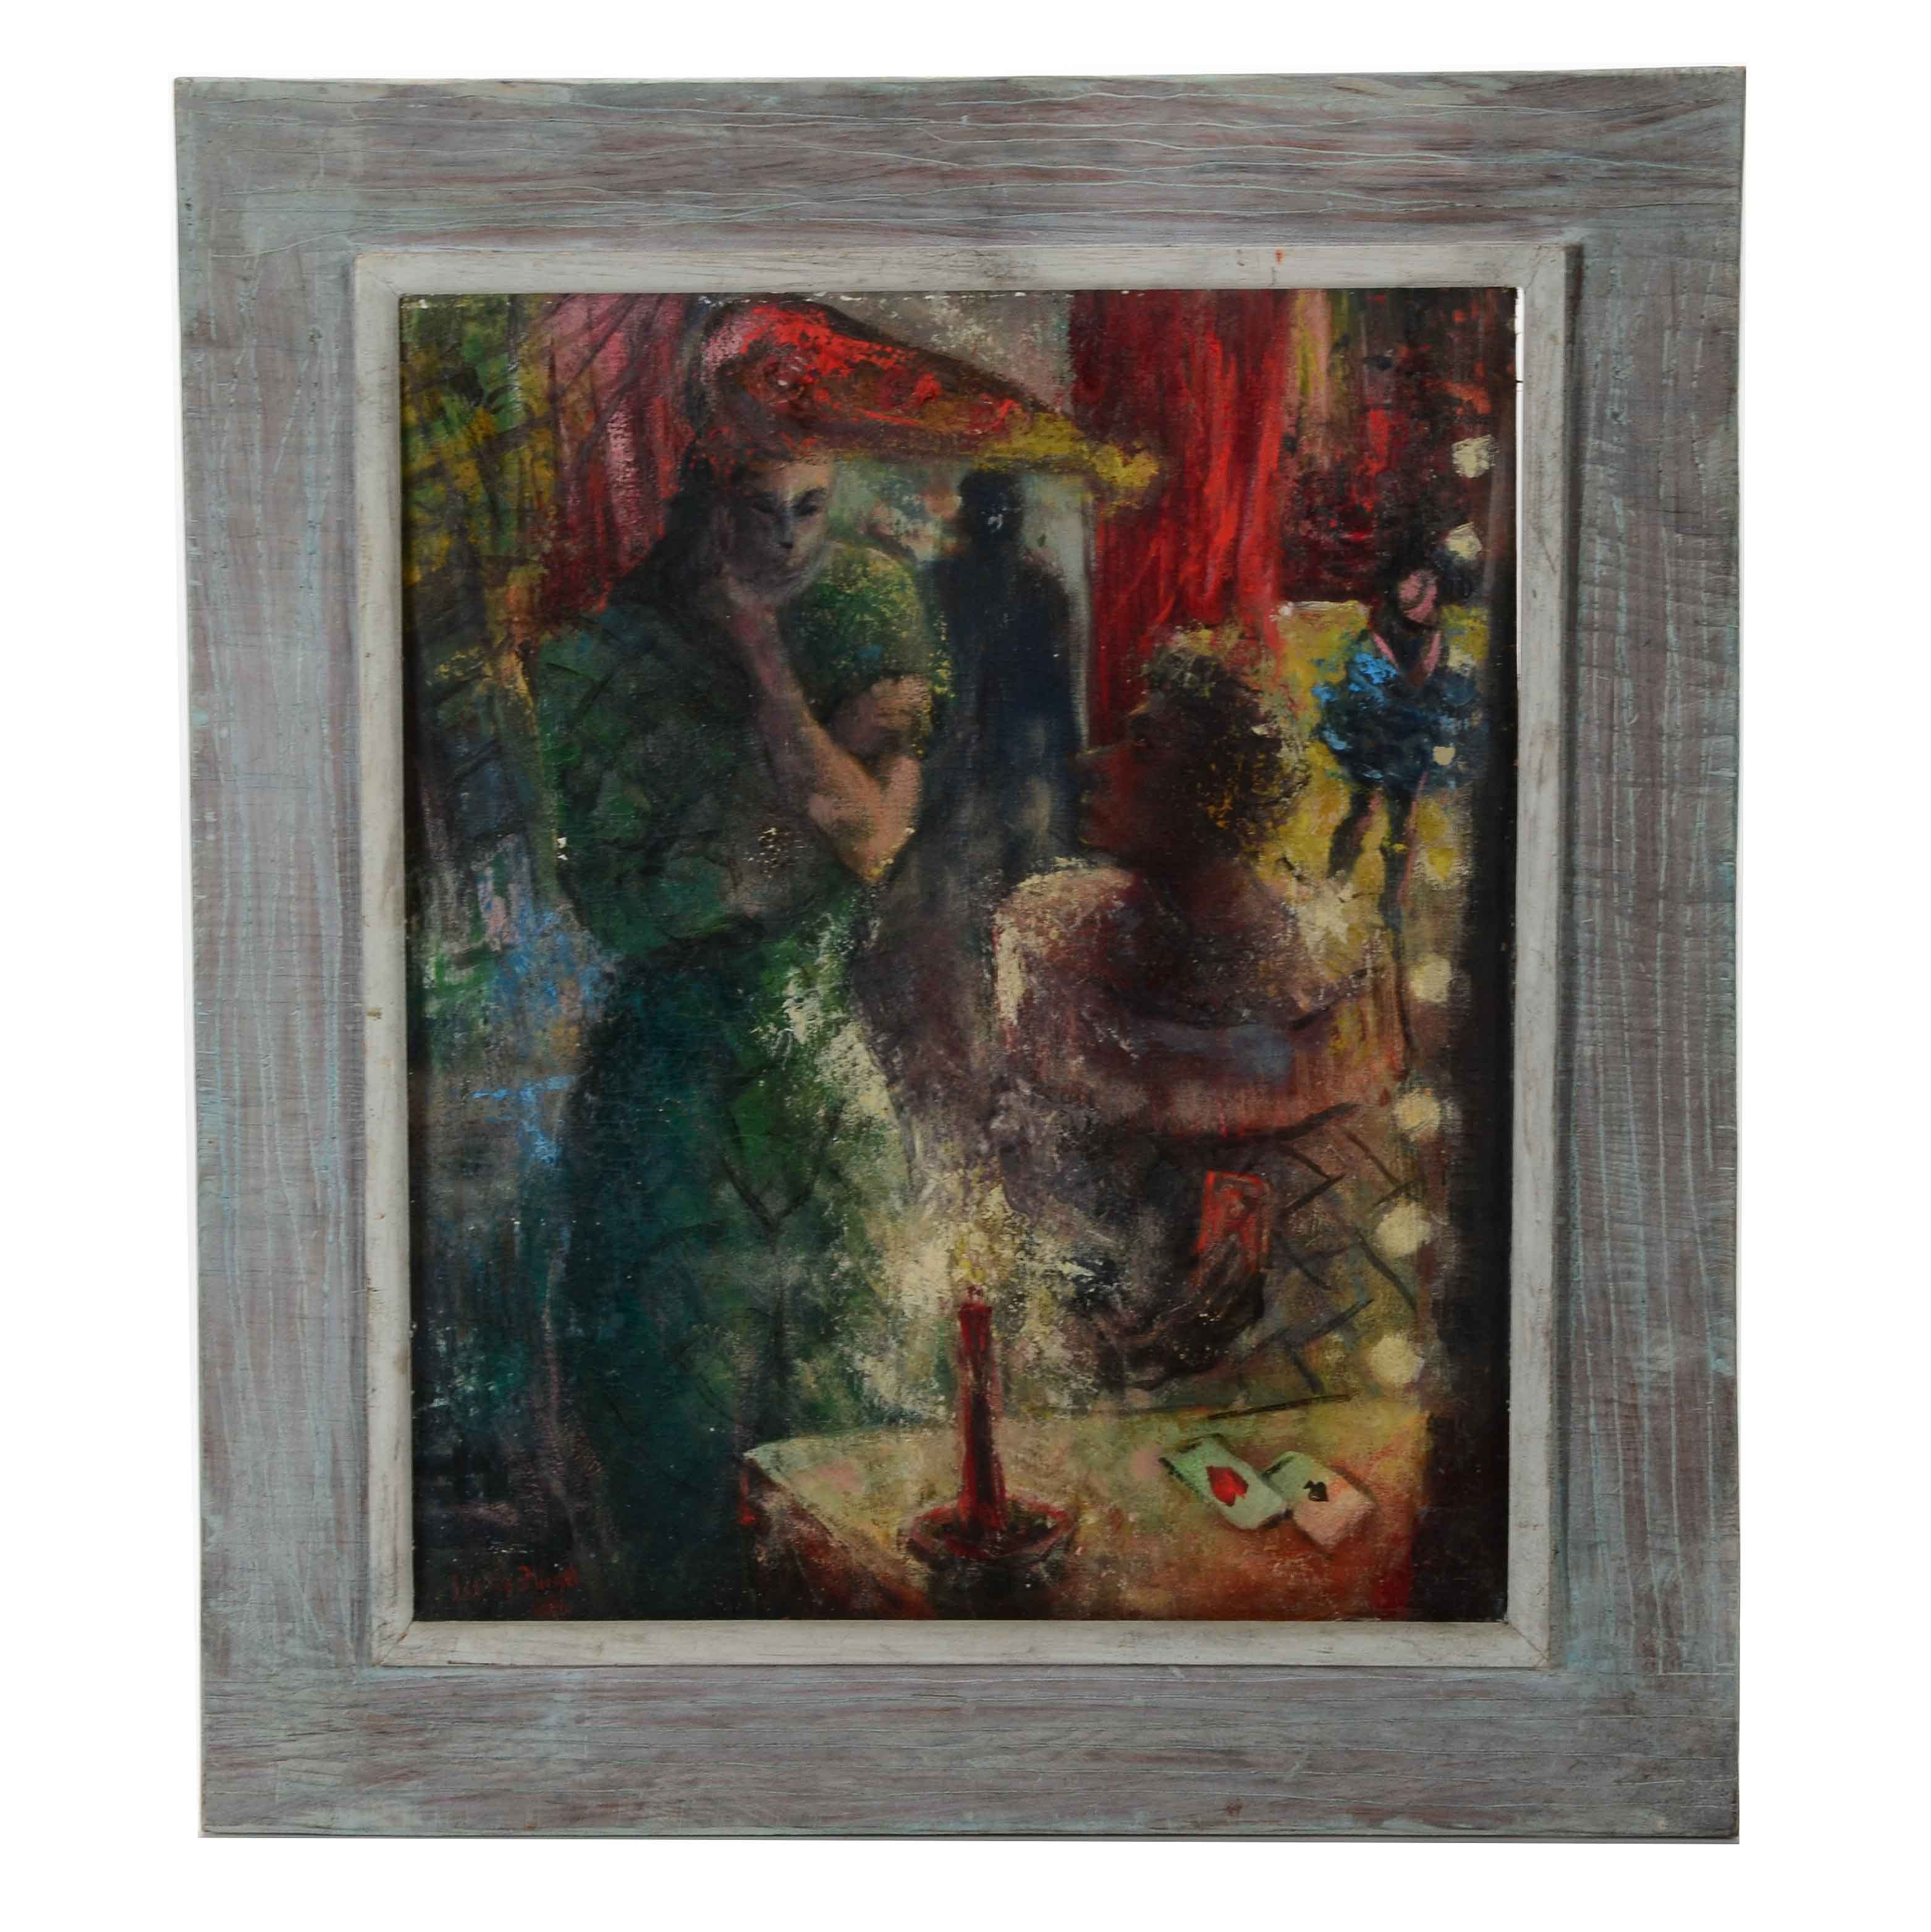 Leslie Fliegel Signed Expressionist Oil Painting